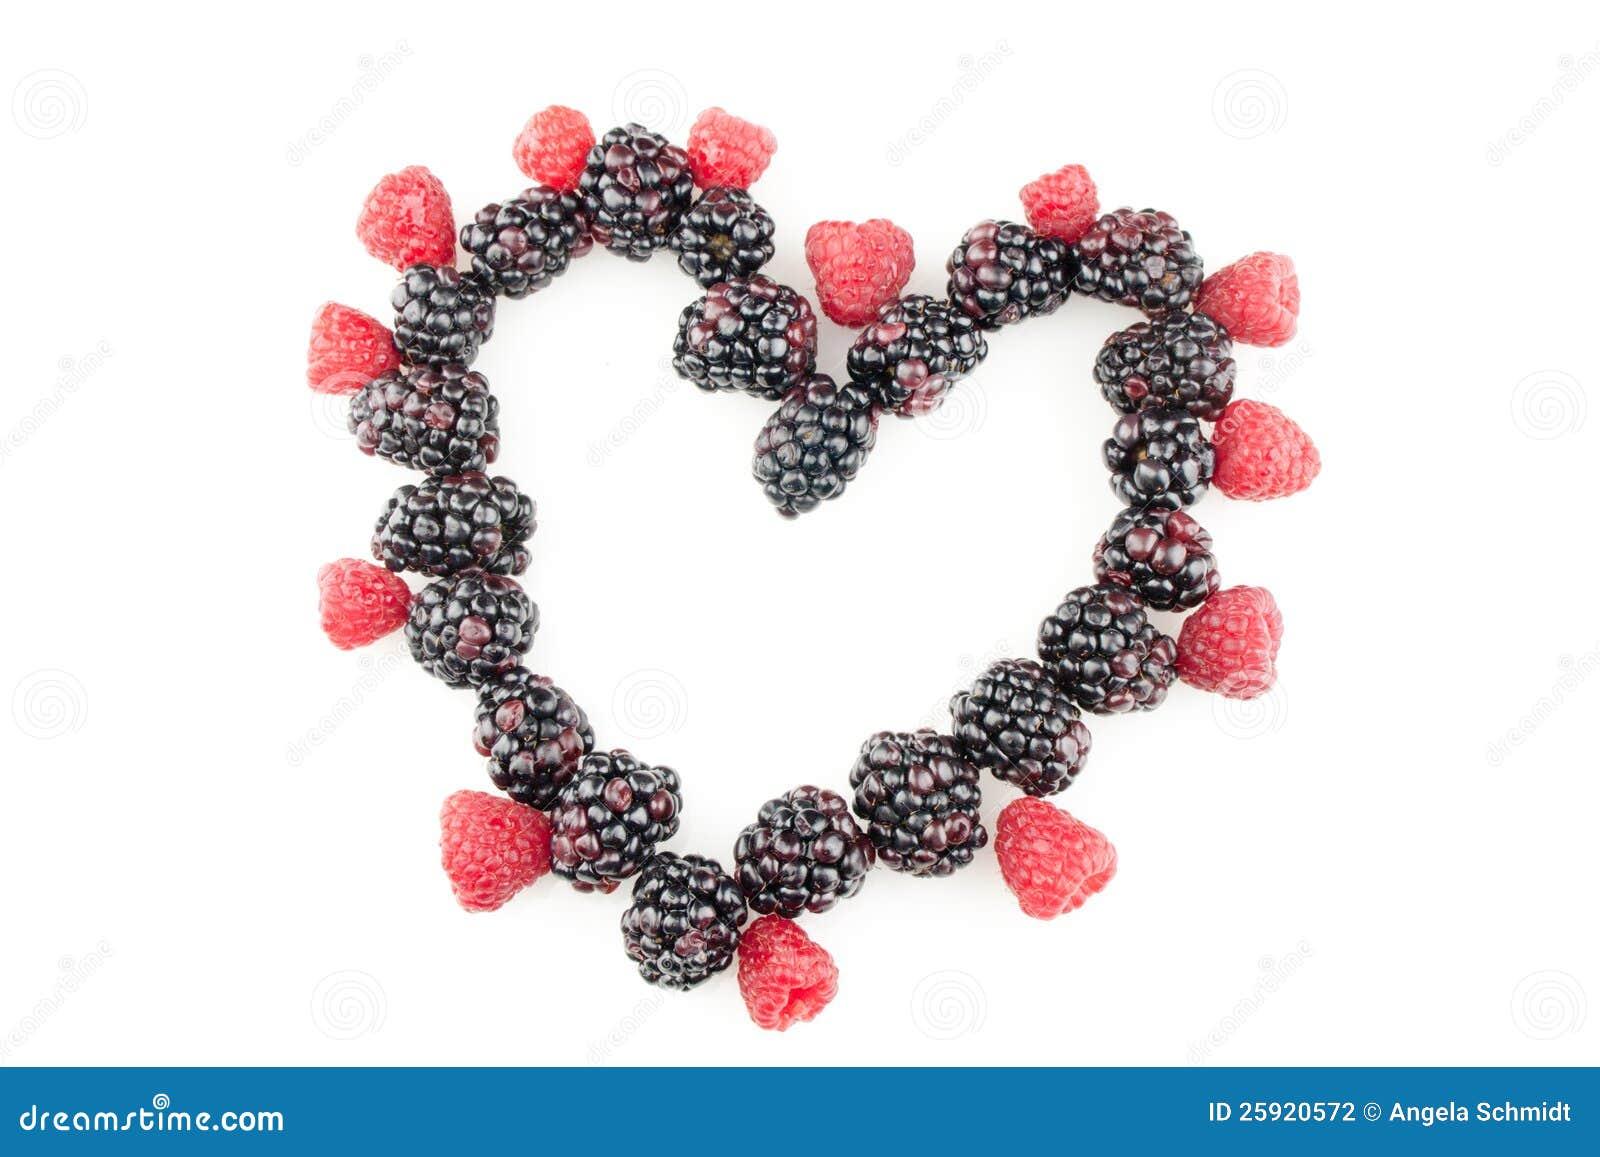 Fruit en forme de coeur photographie stock image 25920572 - Deco en forme de coeur ...